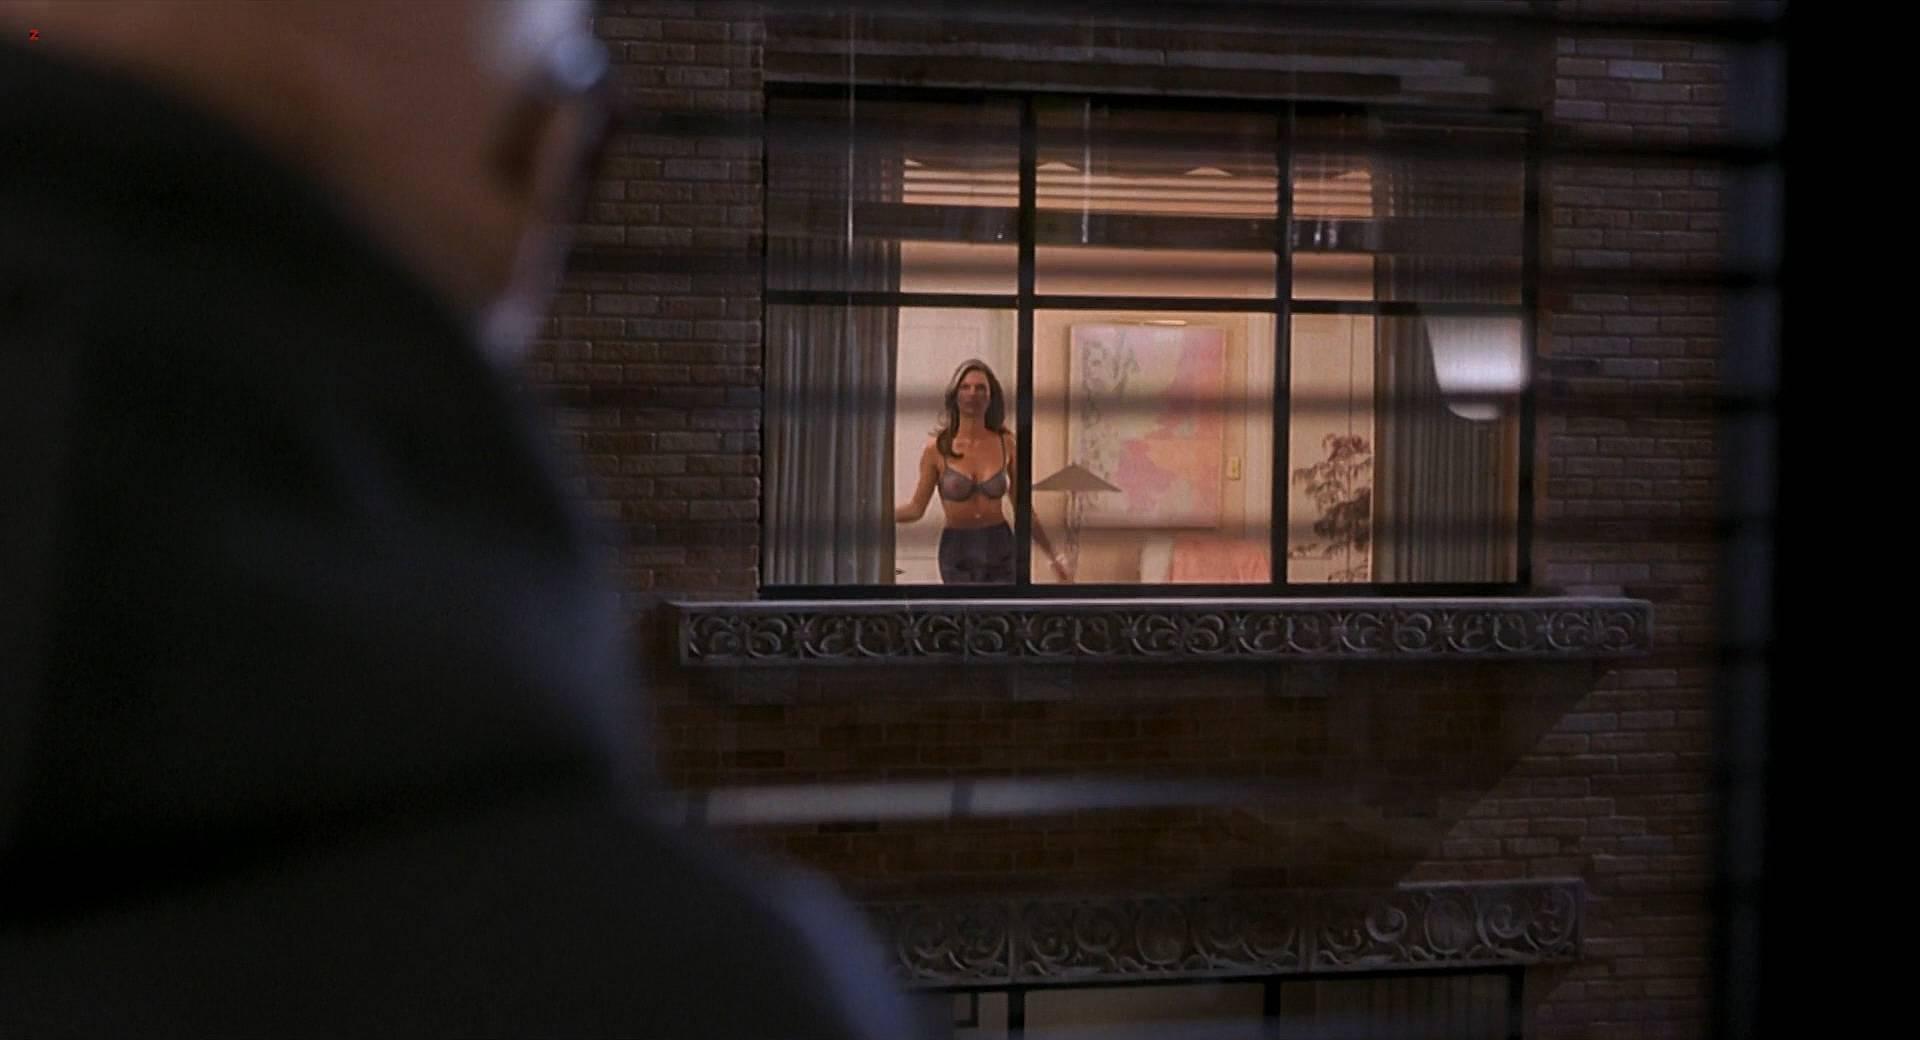 Kim dickens naked boobs hollow man